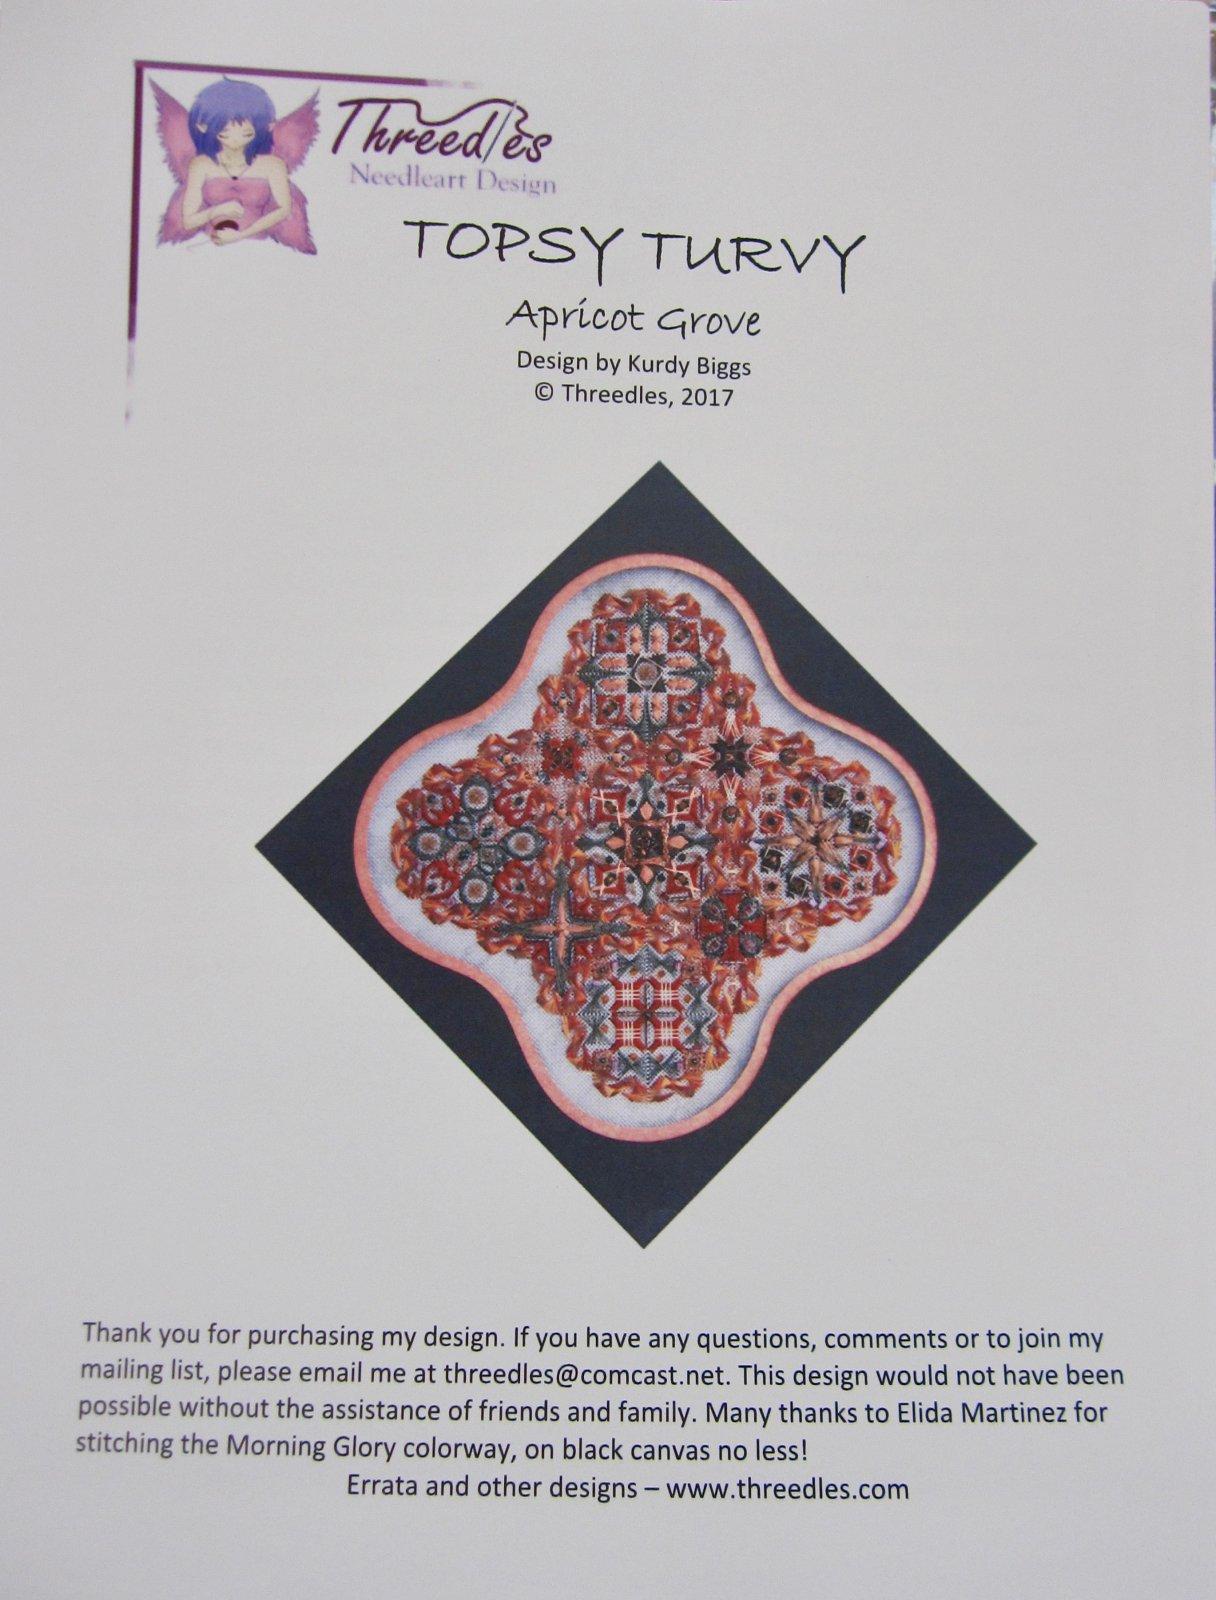 Topsy Turvey, Apricot Grove